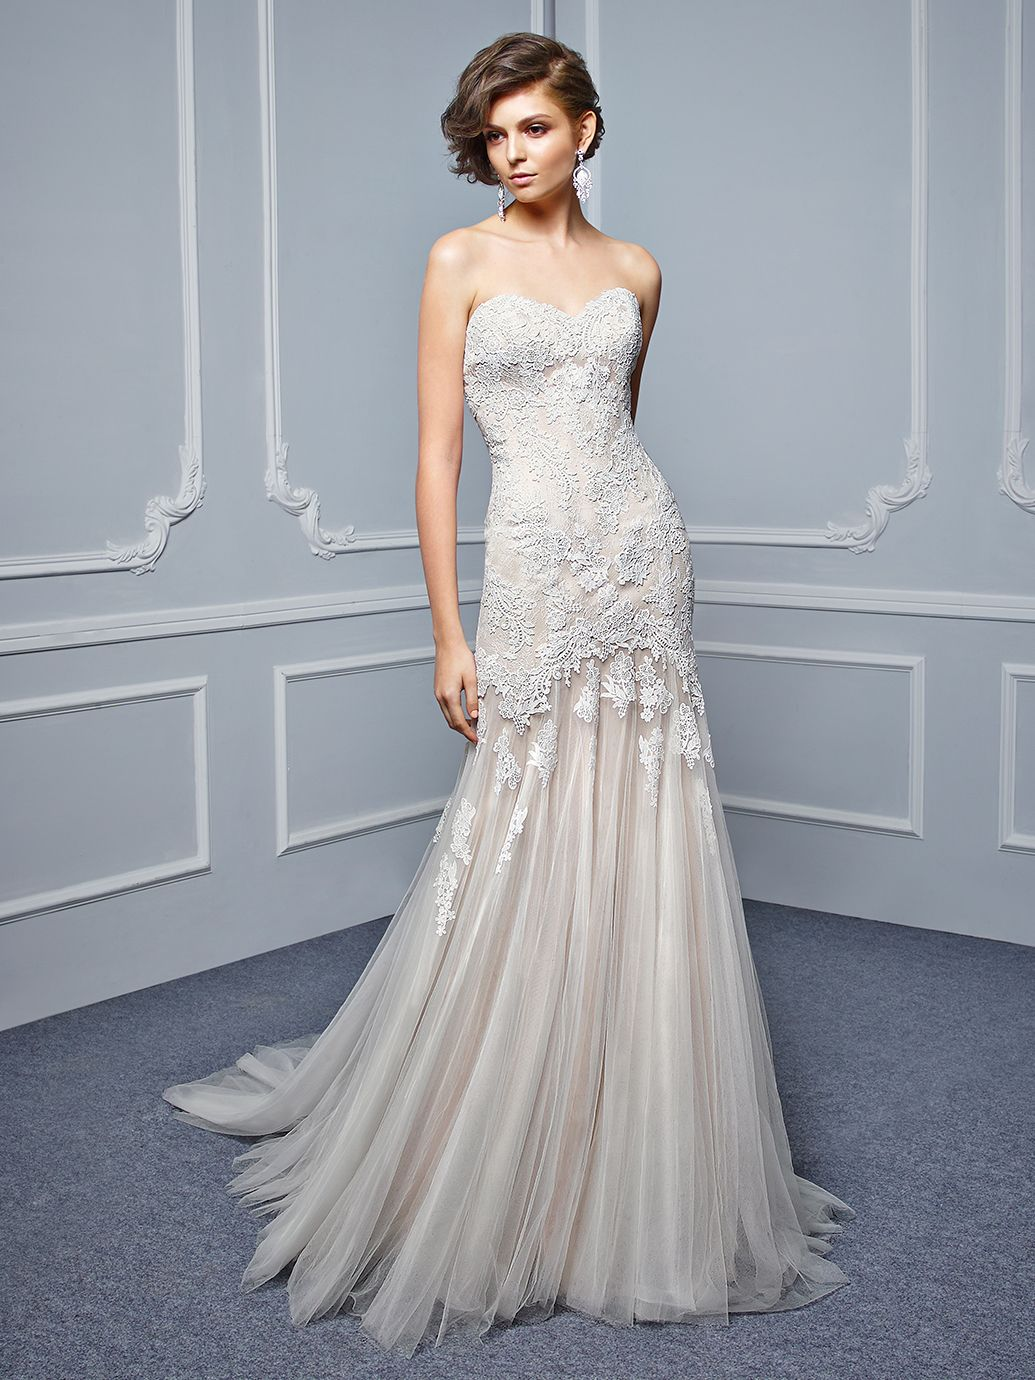 1078837e8e0d 2017 Beautiful, BT17-31, Front View Affordable Wedding Dresses, Best  Wedding Dresses